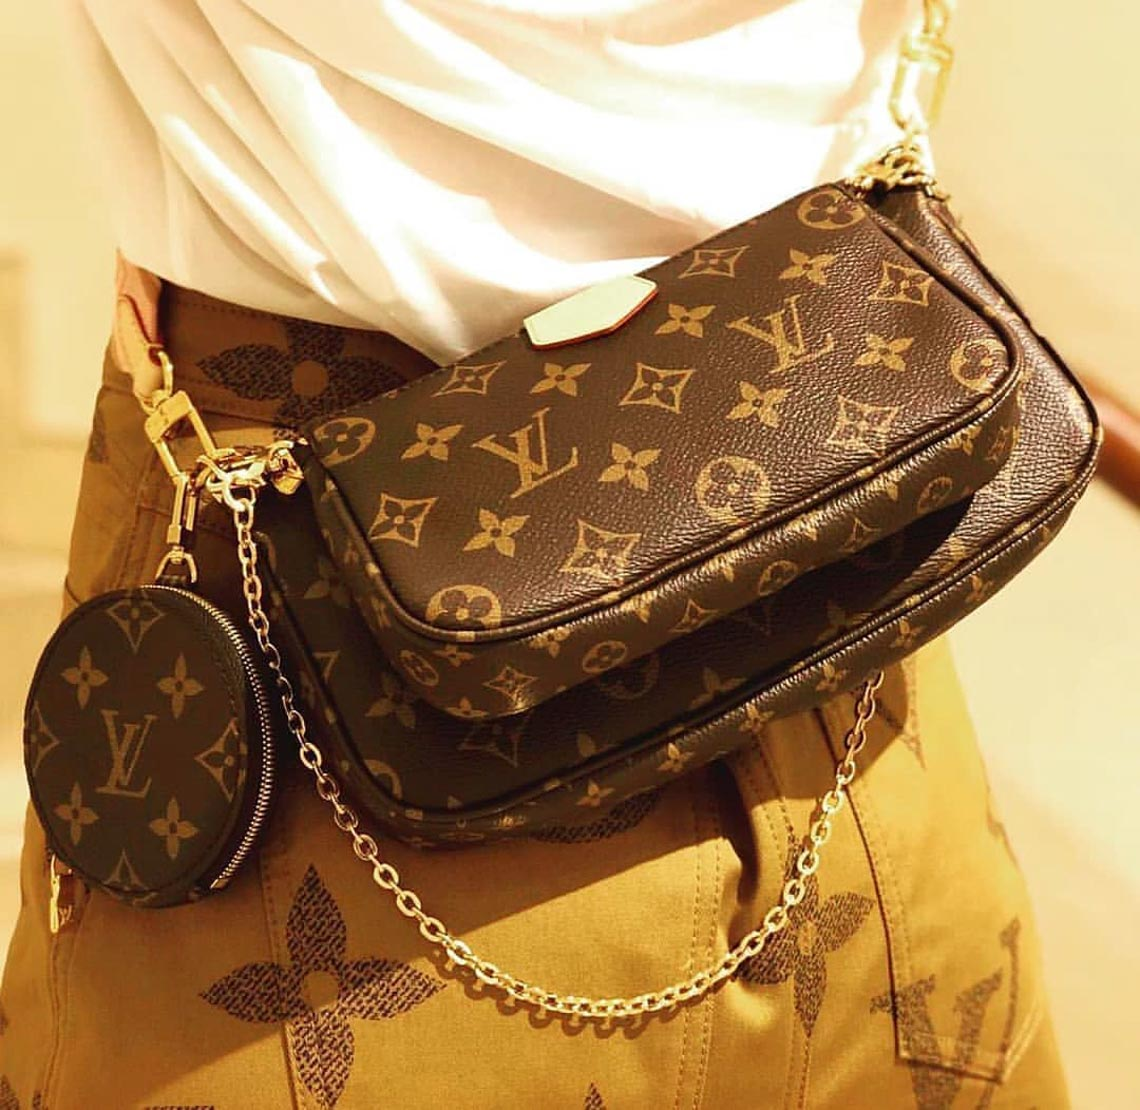 Multi Pochette - mẫu túi biến tấu mới của nhà Louis Vuitton - 5